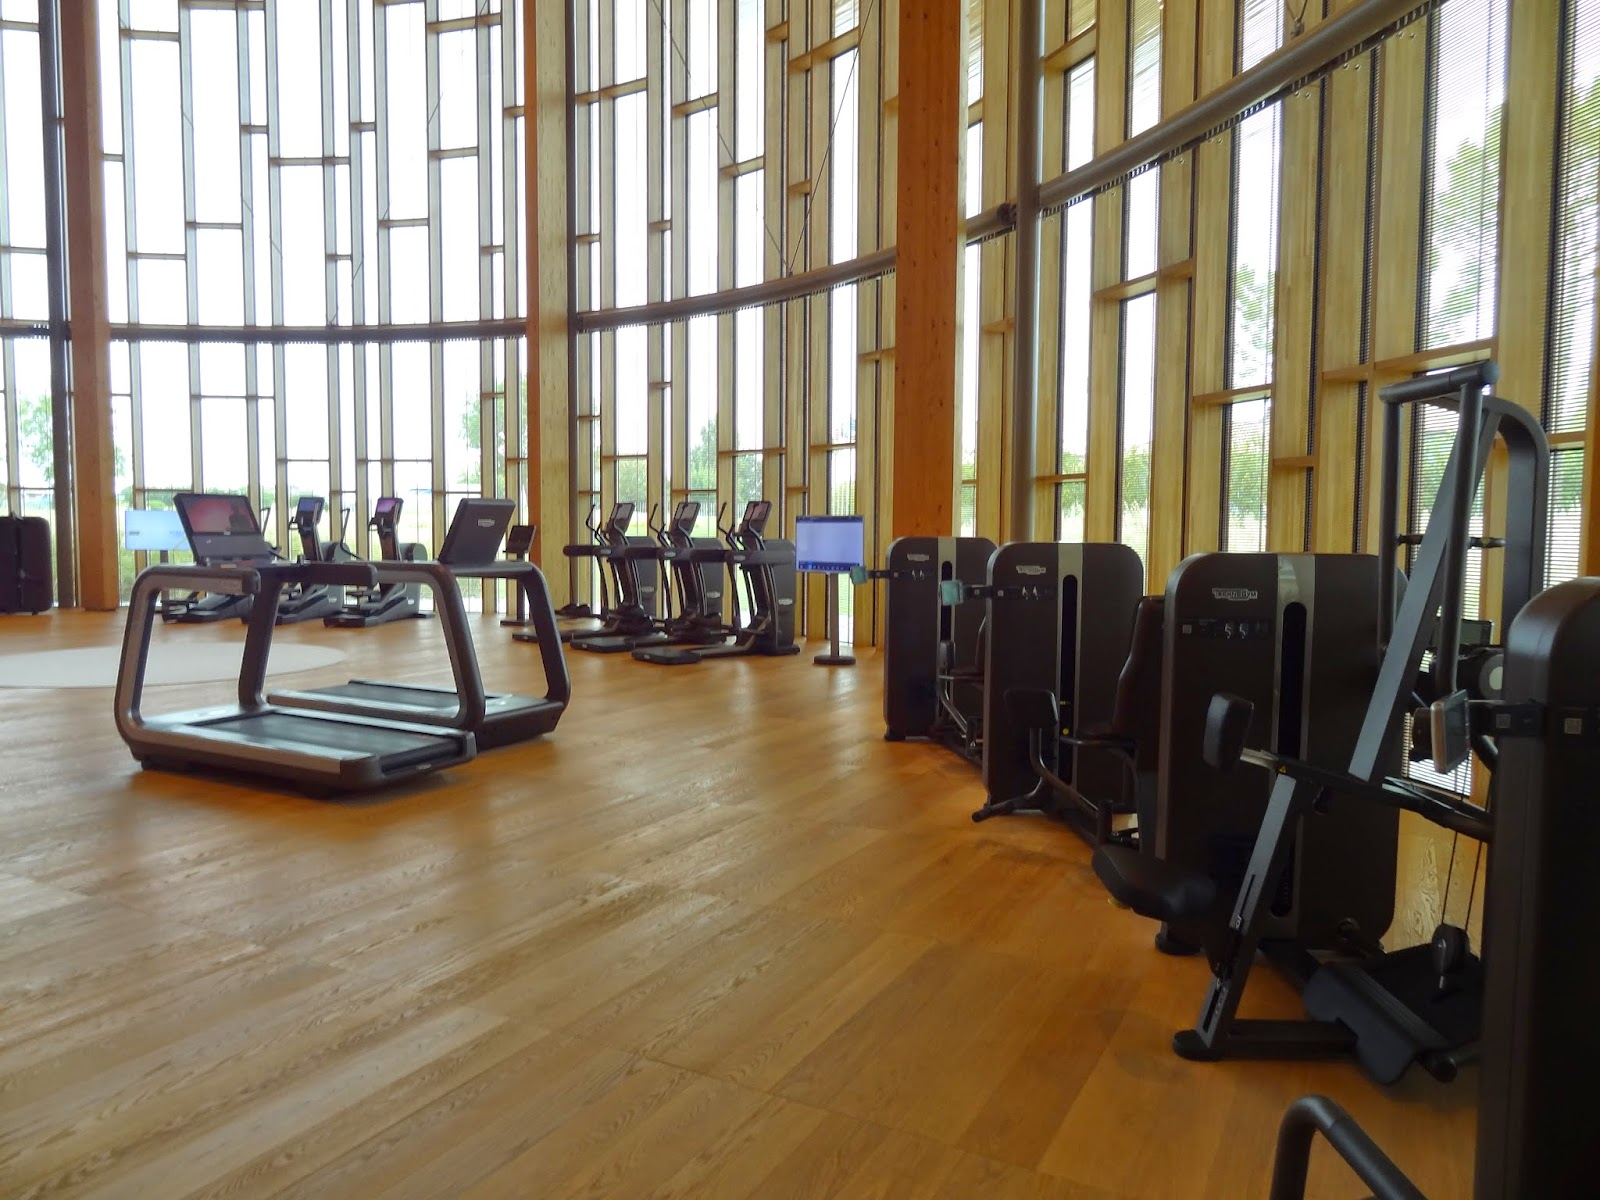 Technogym Wellness Village Gym Showroom Artis